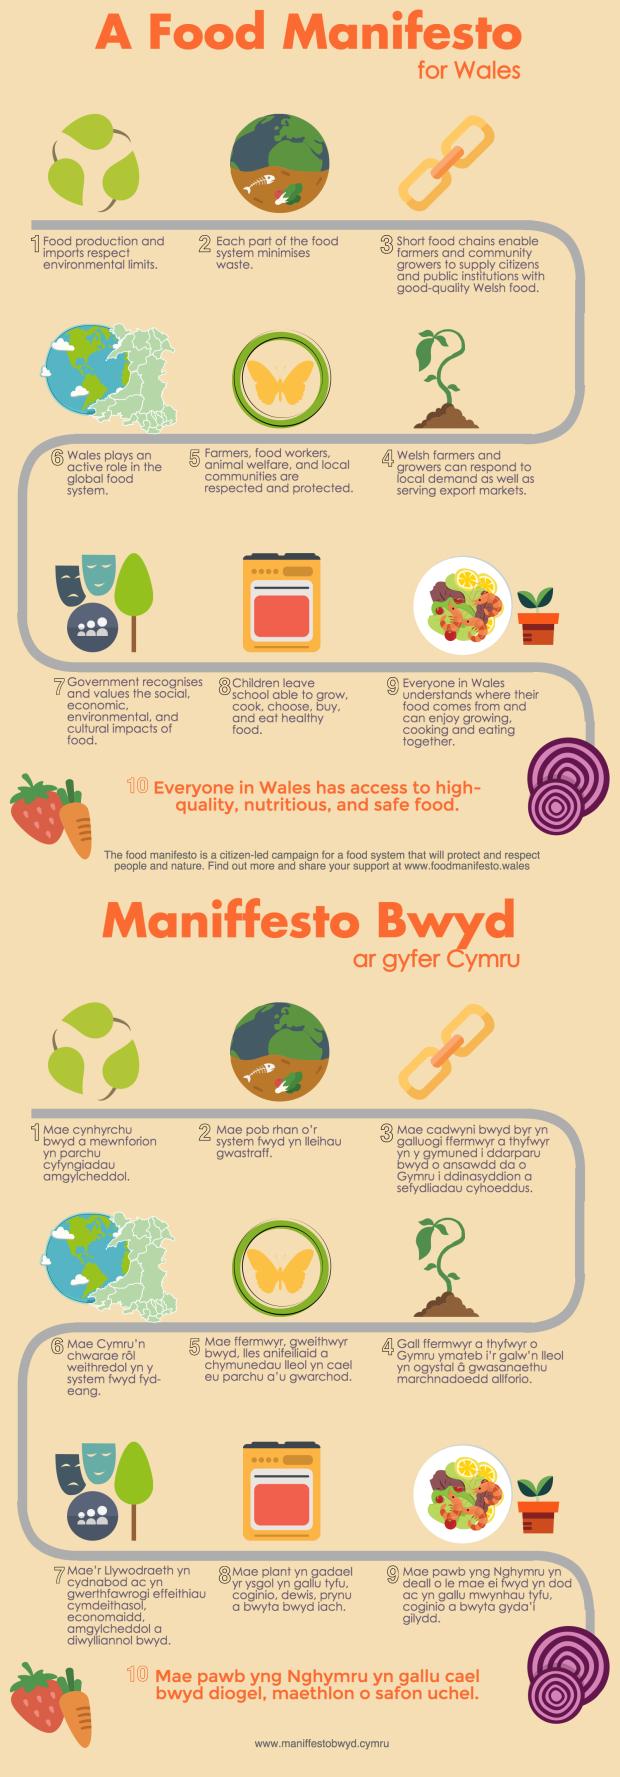 food-manifesto-maniffesto-bwyd poster